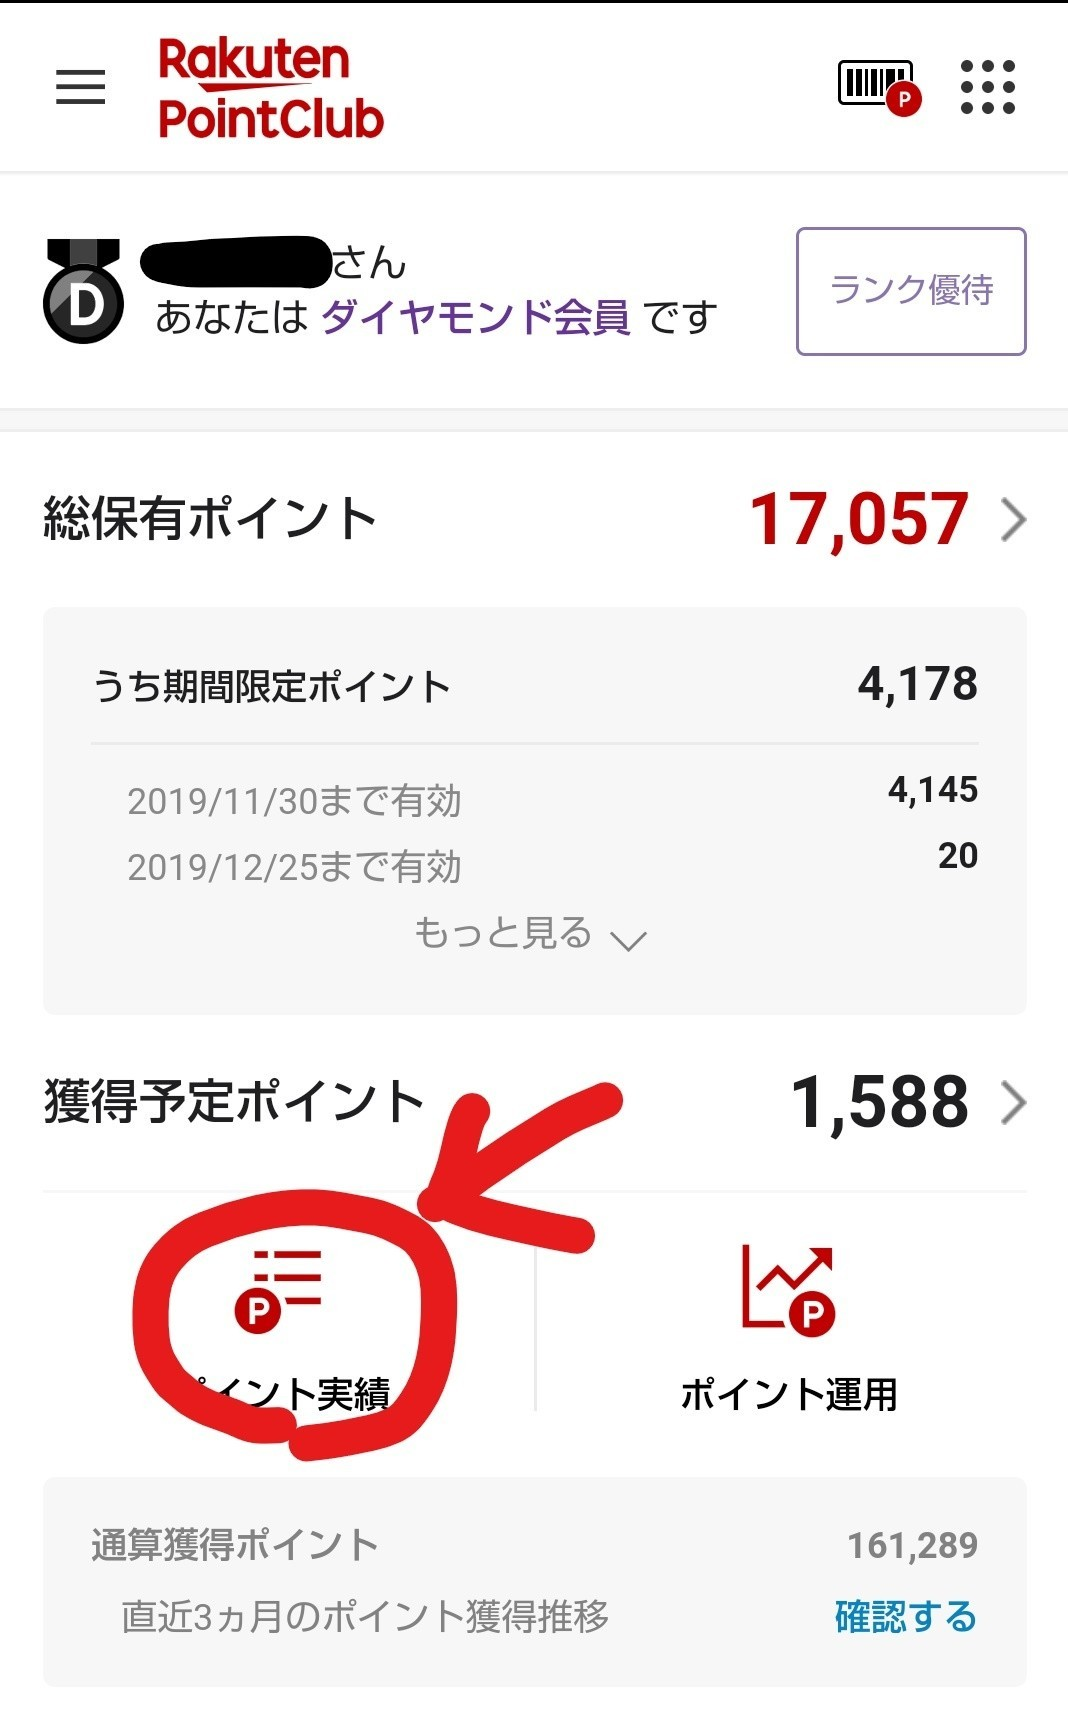 Inked楽天ポイント10月実績モバイルログイン①_LI